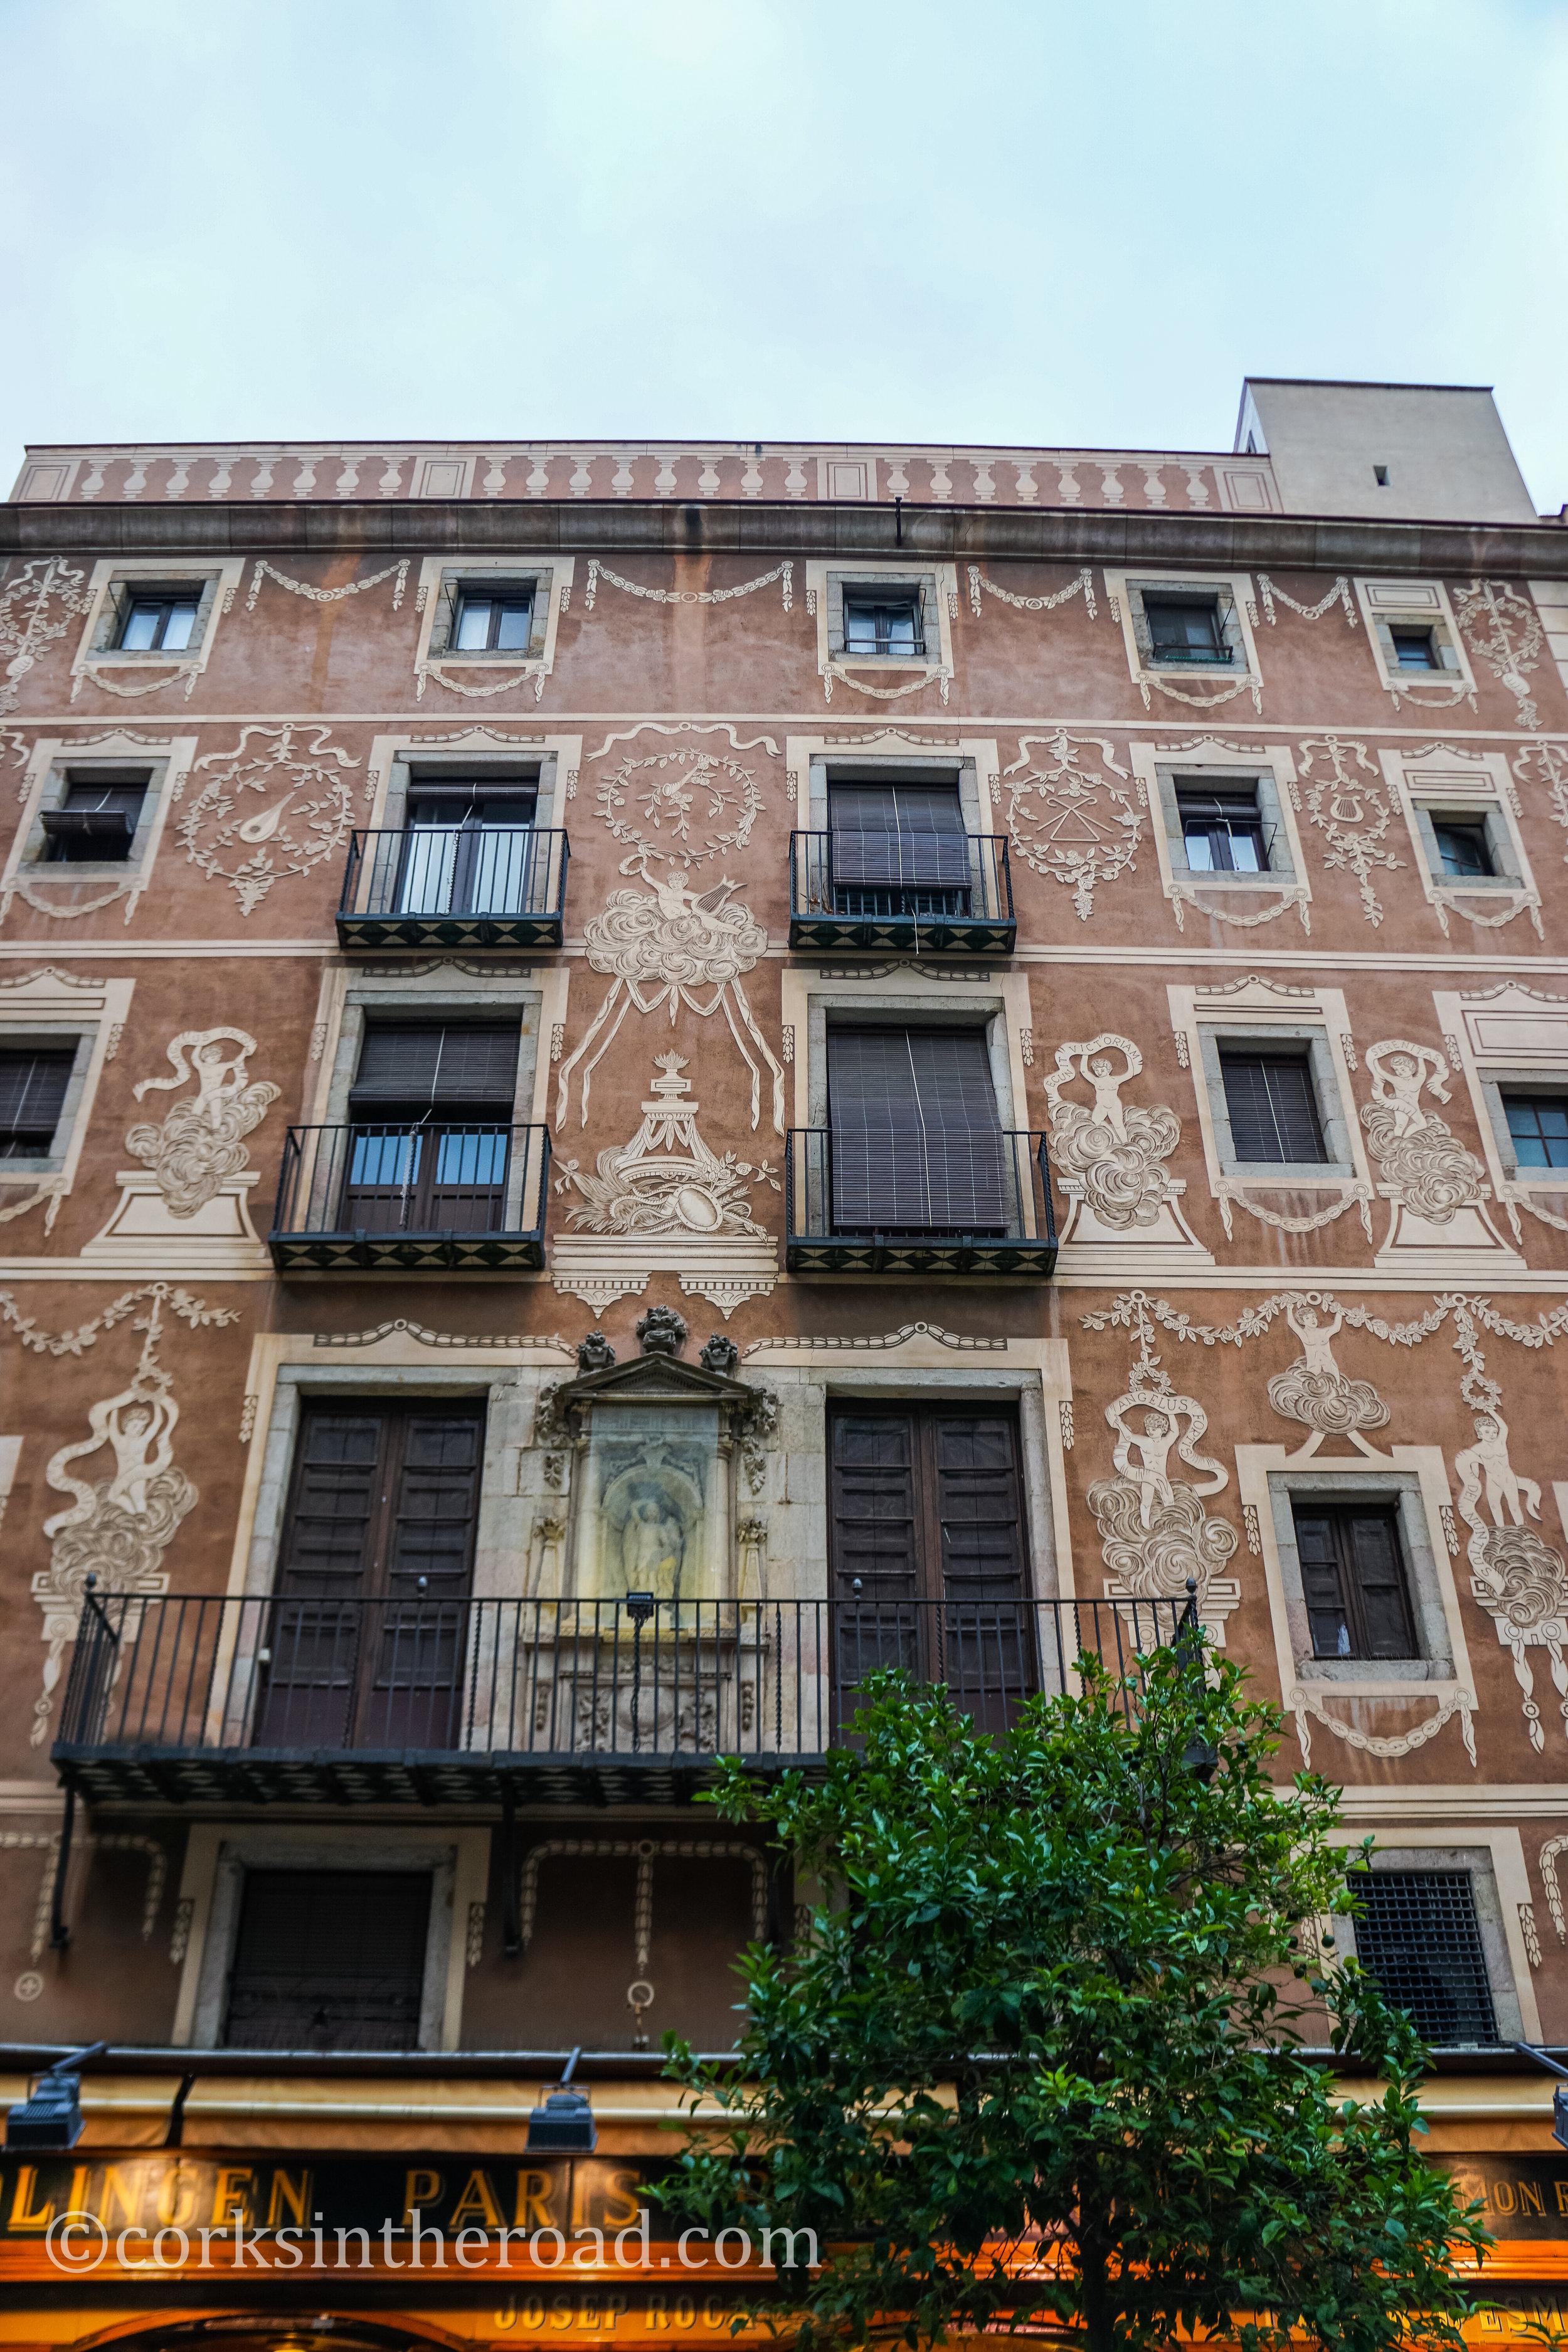 20160805Architecture, Barcelona, Corksintheroad-22.jpg